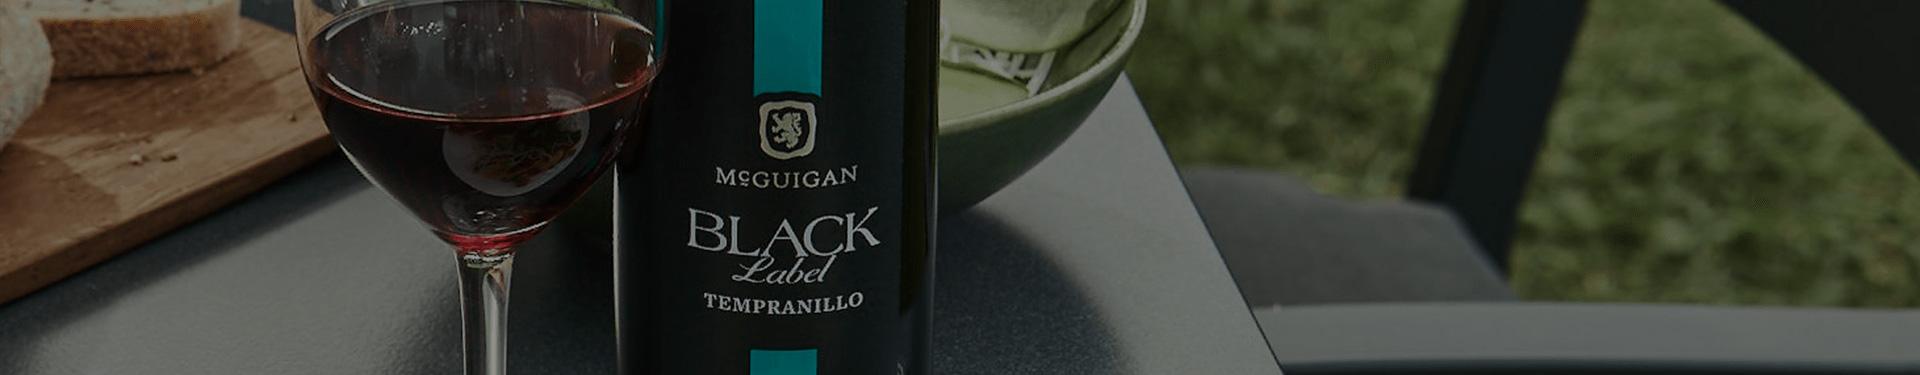 McGugian Black Label Tempranillo